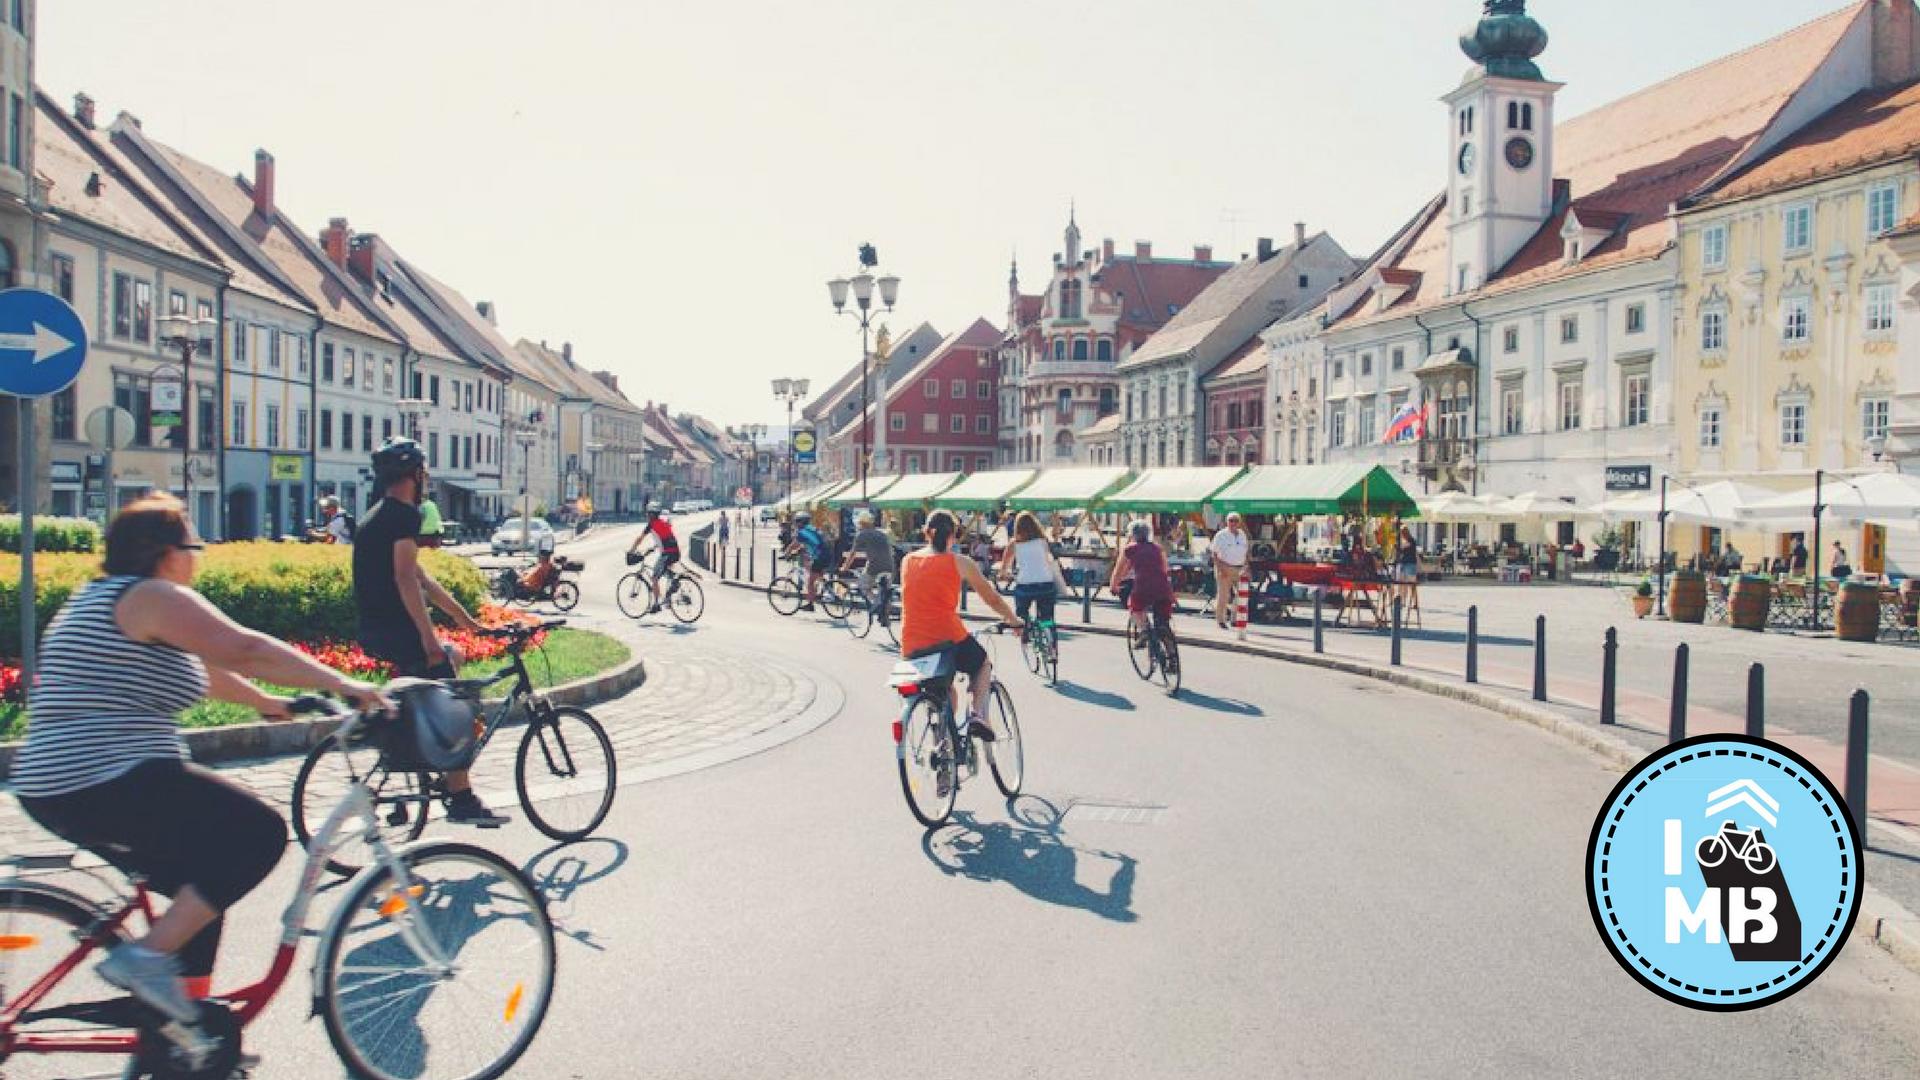 Širimo kolesarsko kulturo